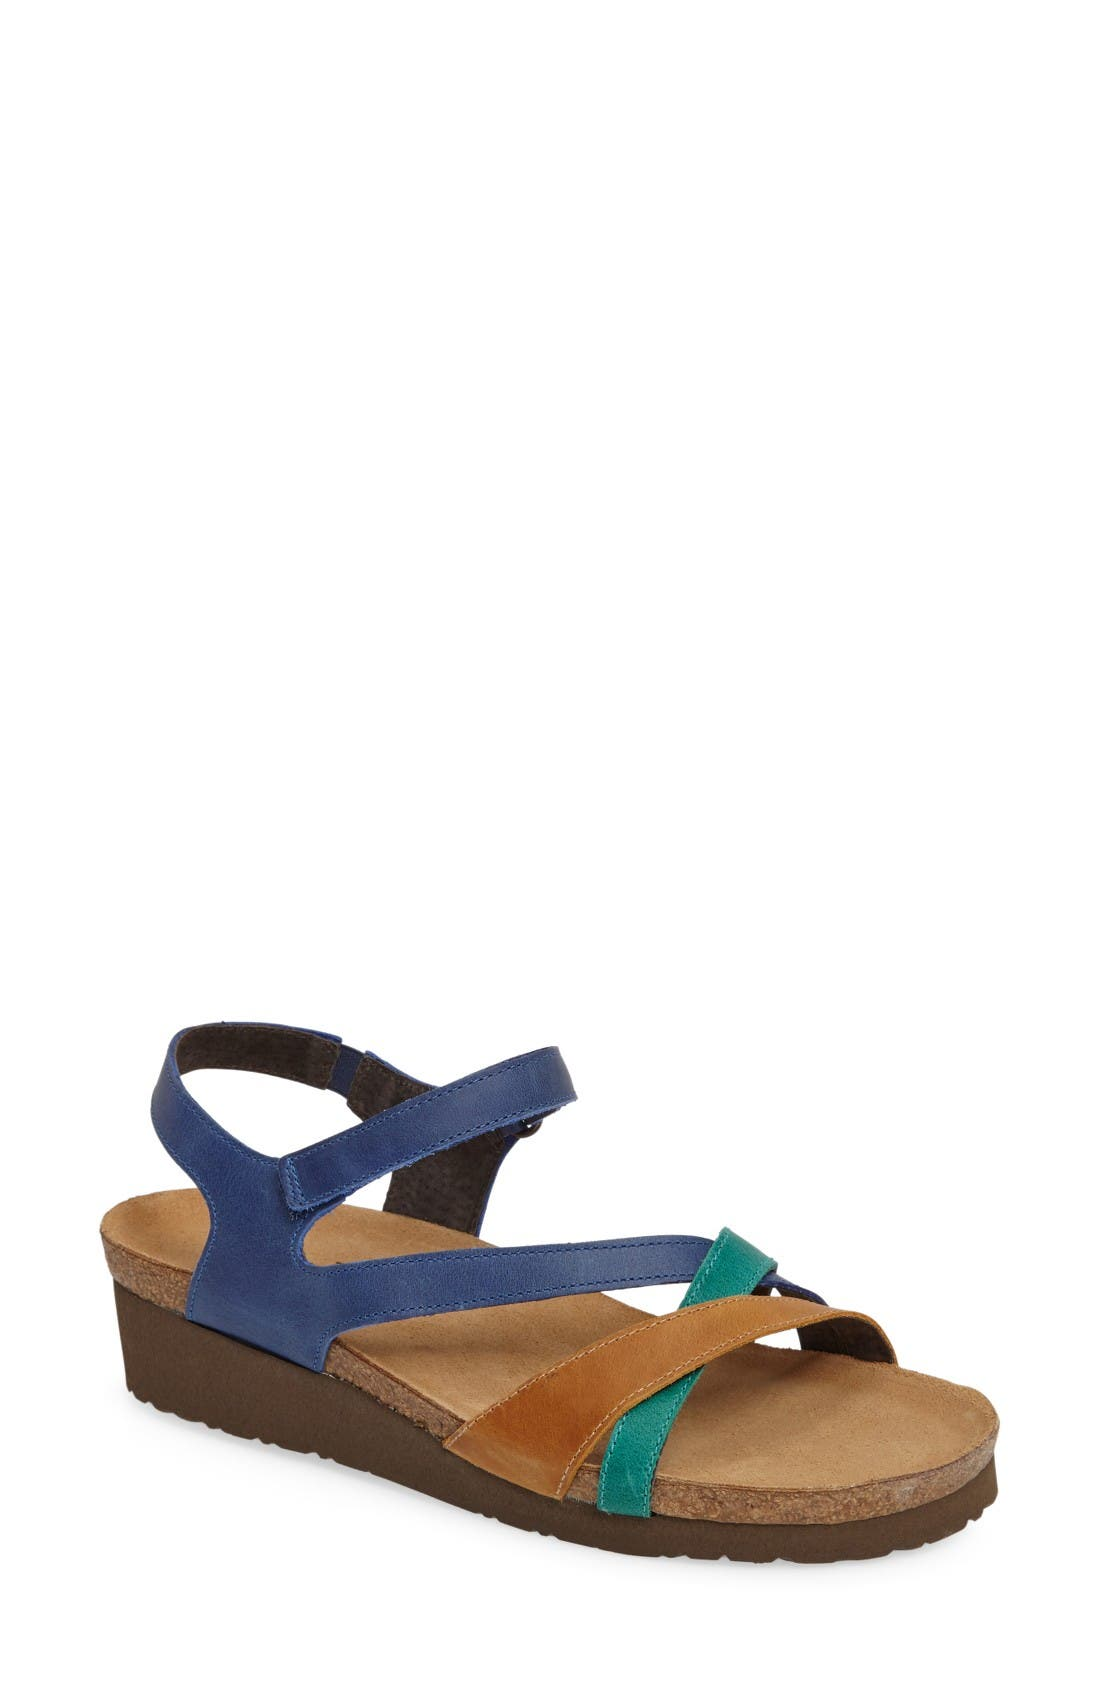 Alternate Image 1 Selected - Naot 'Sophia' Sandal (Women)